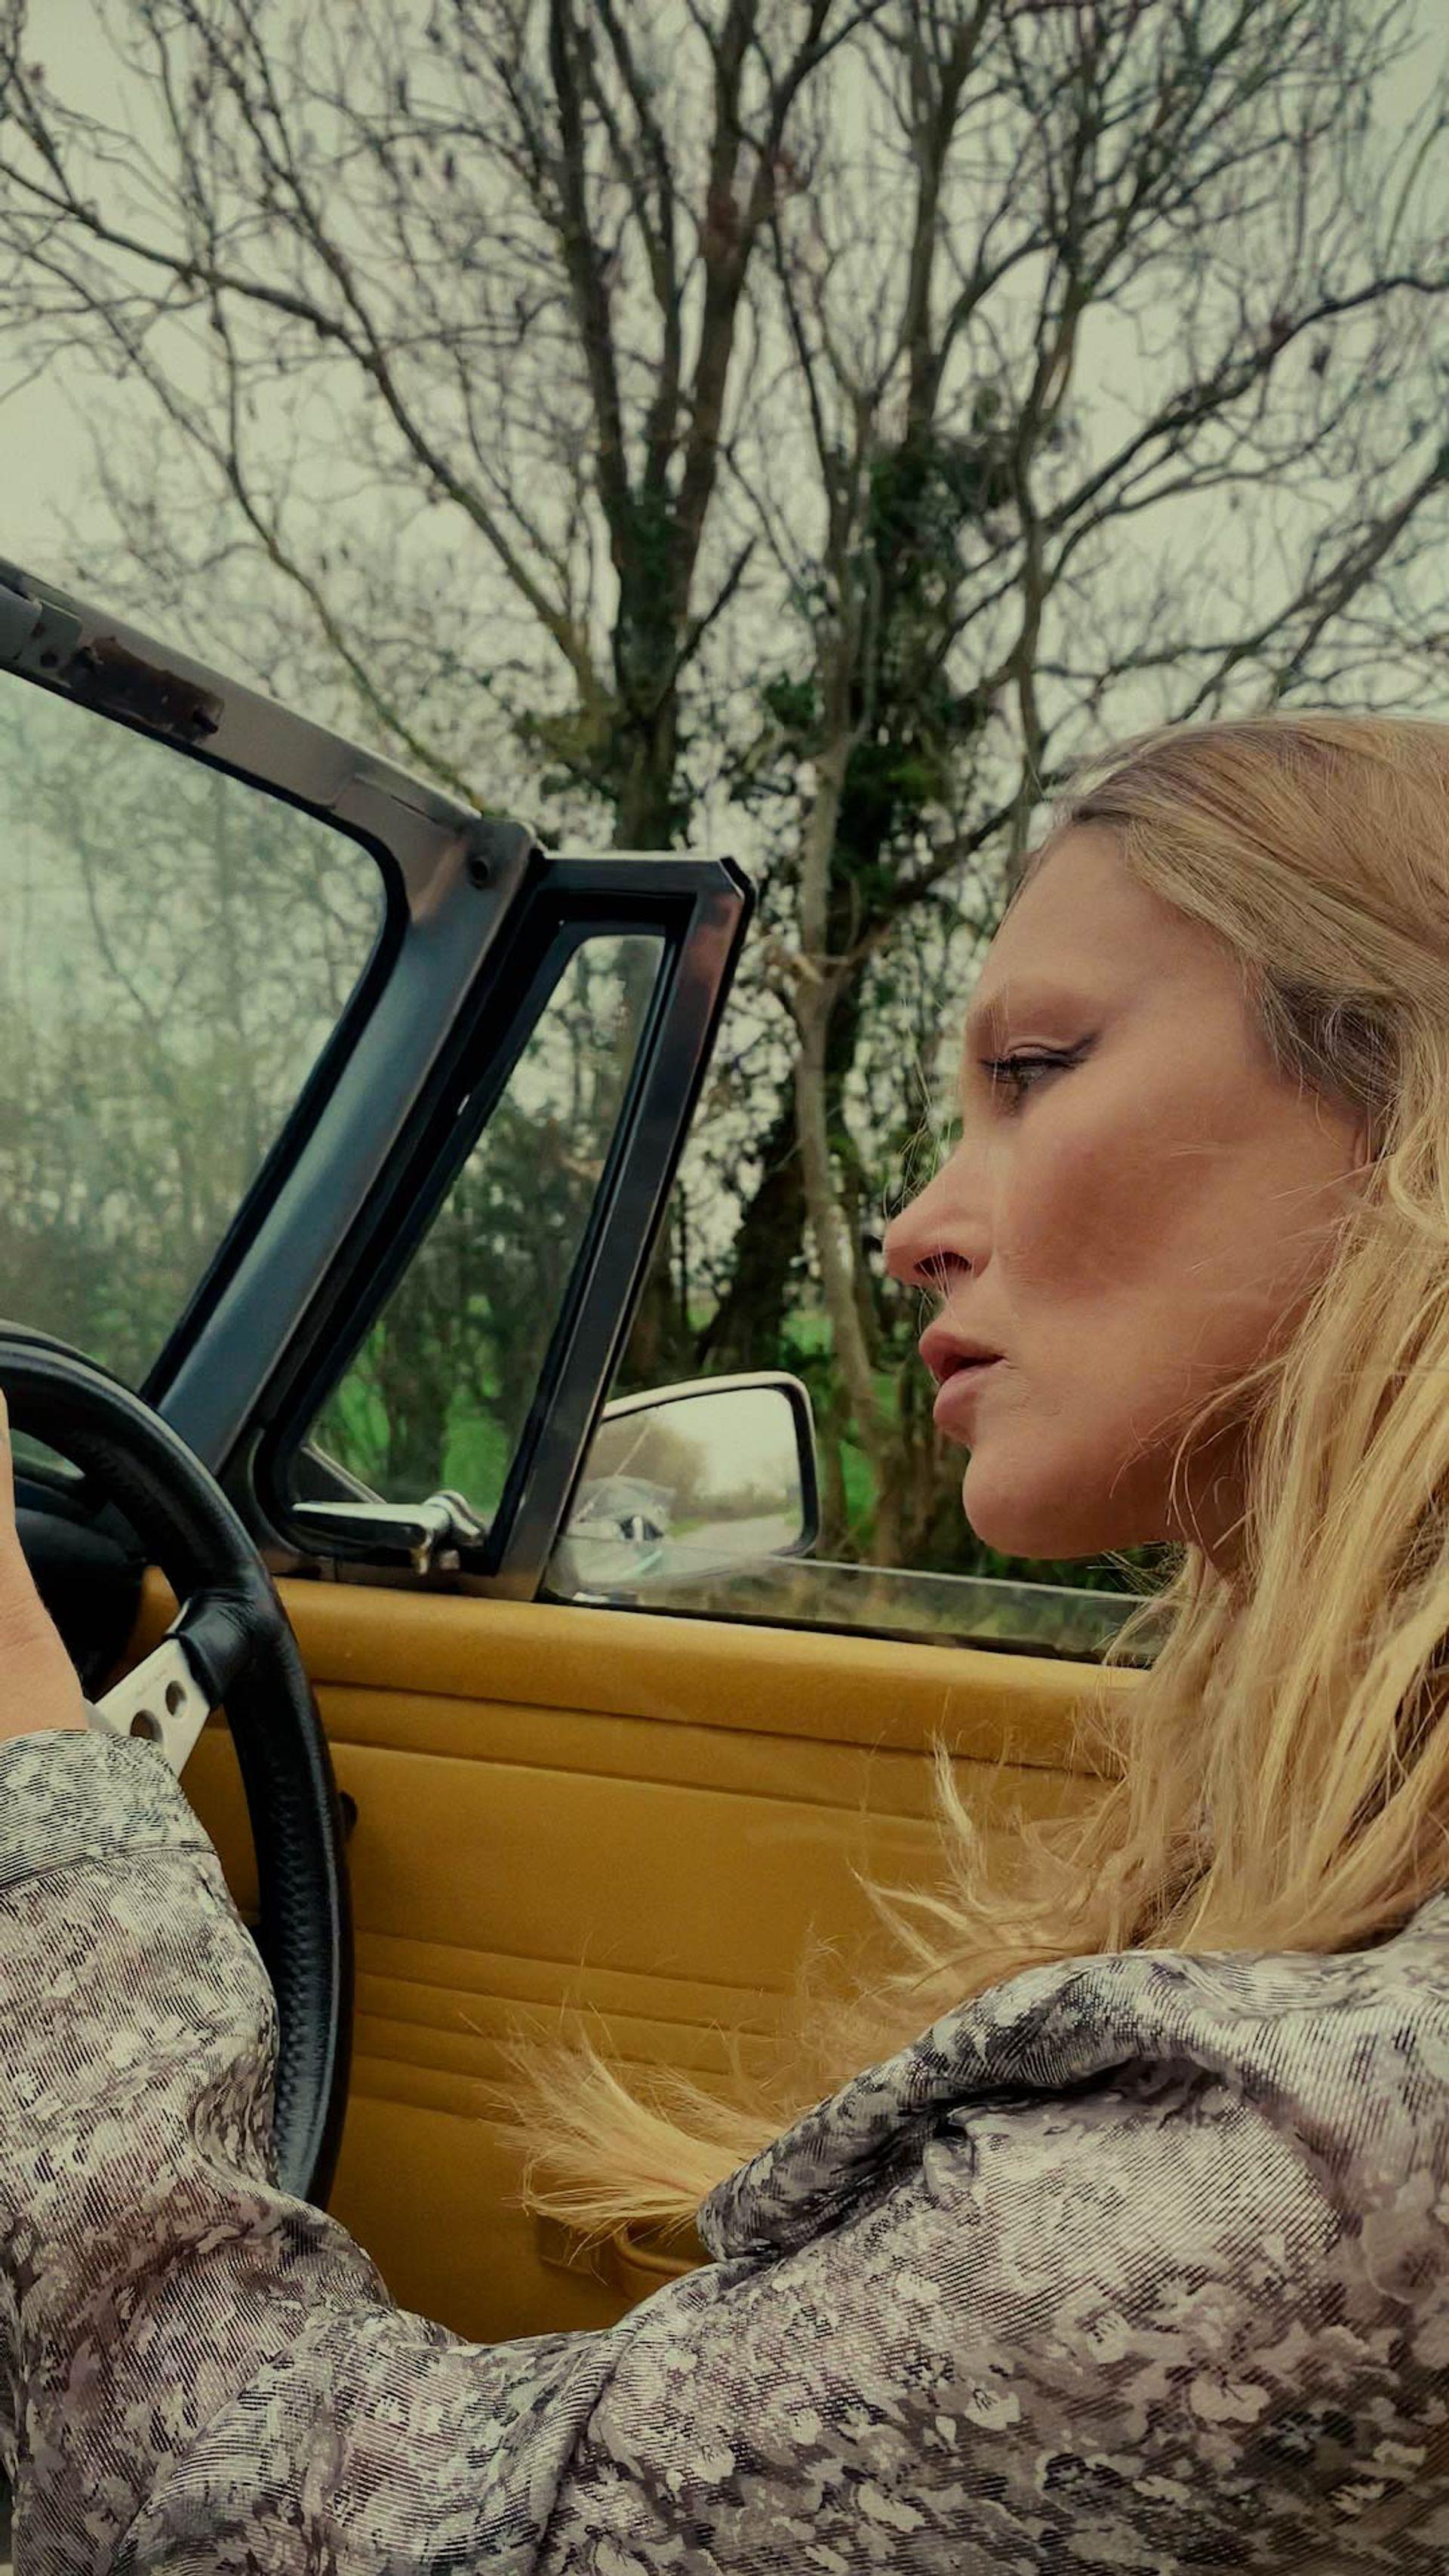 Kate Moss courtesy @MITNFT